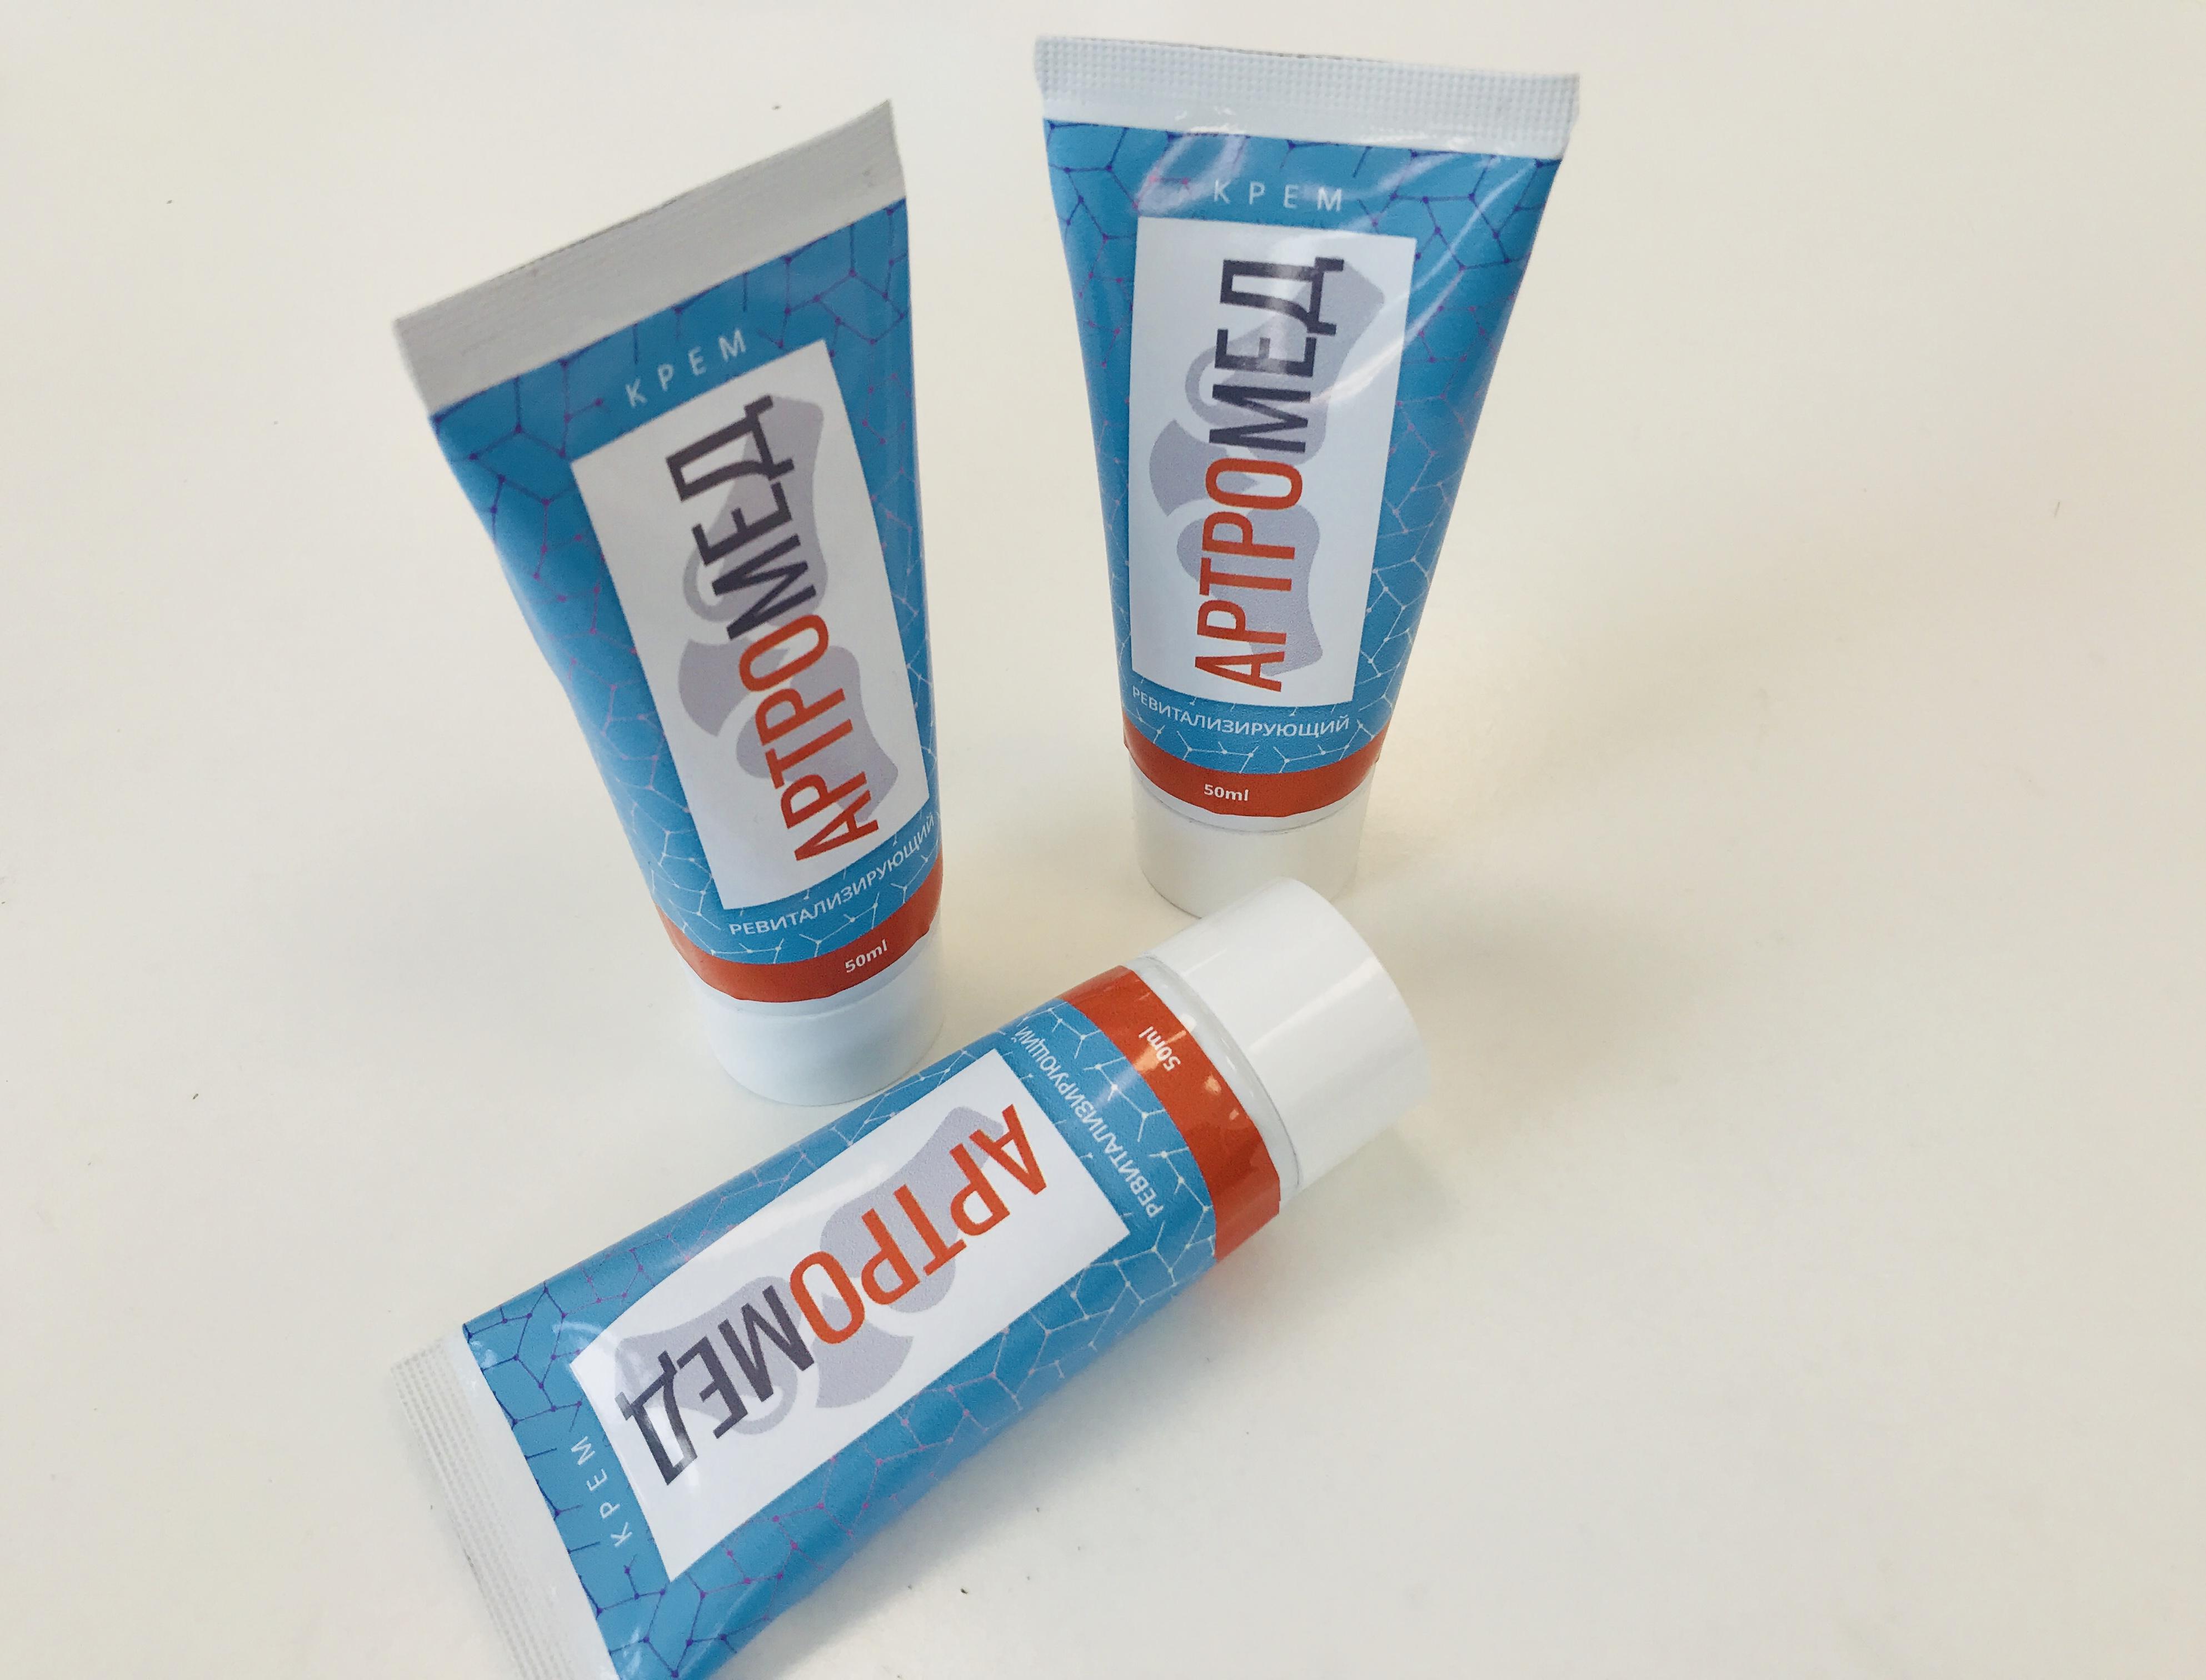 Упаковка крема Артромед